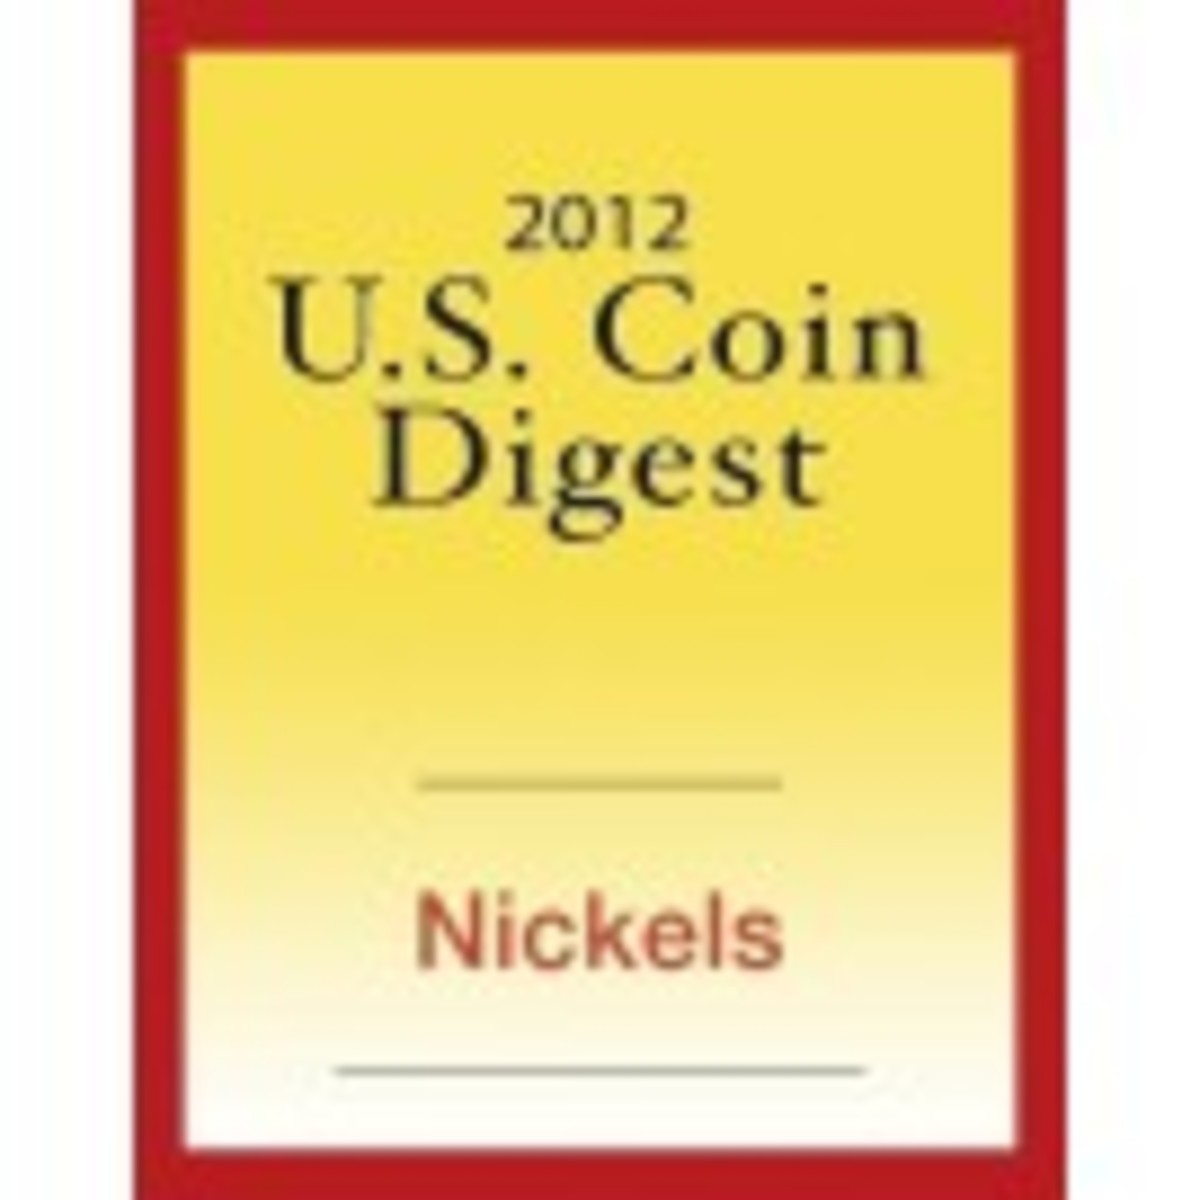 2012 U.S. Coin Digest: Nickels